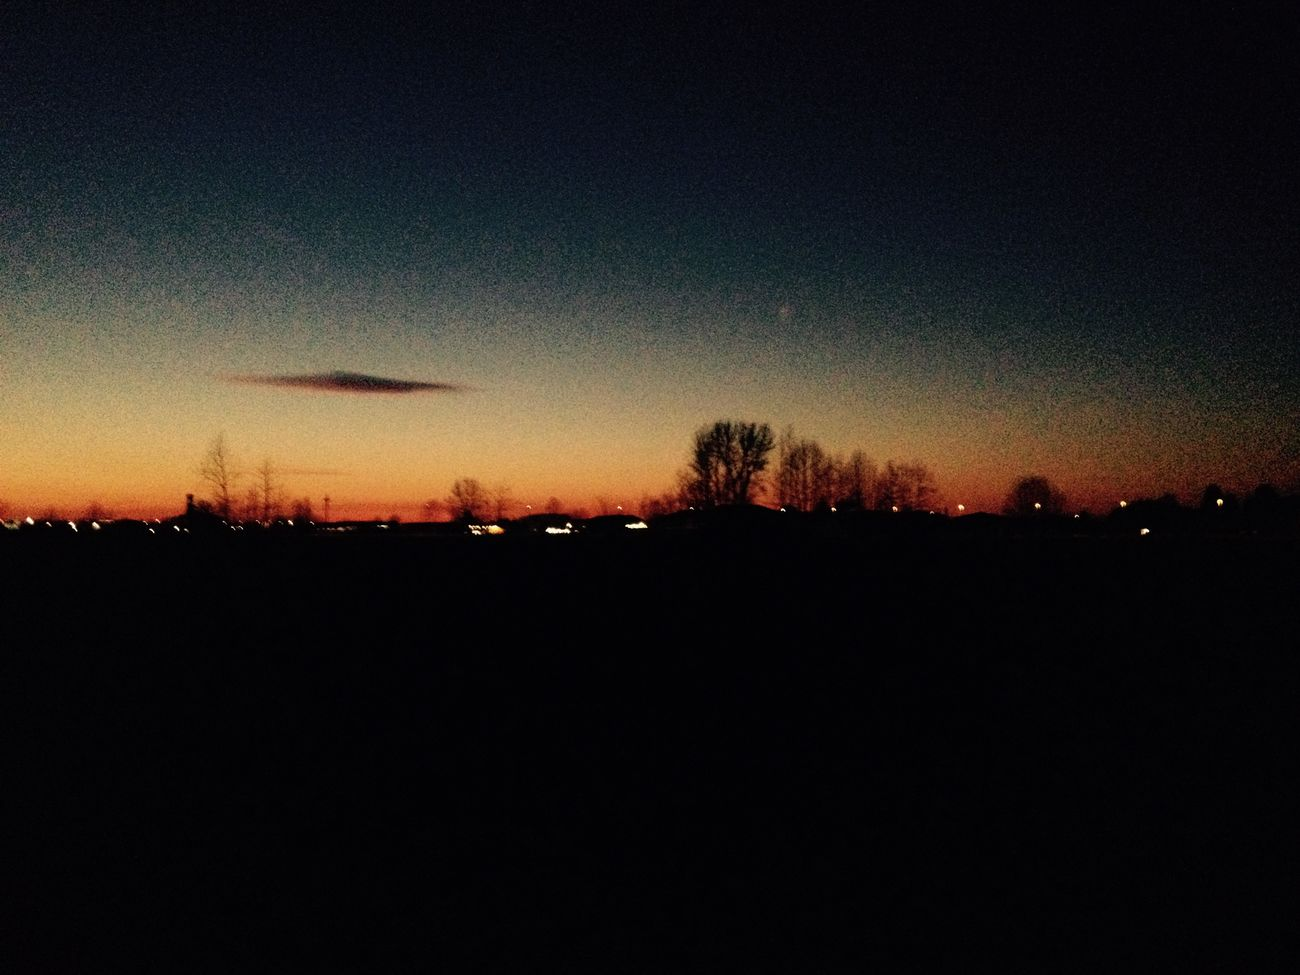 Paesaggi tramonto mozzafiato 🌇